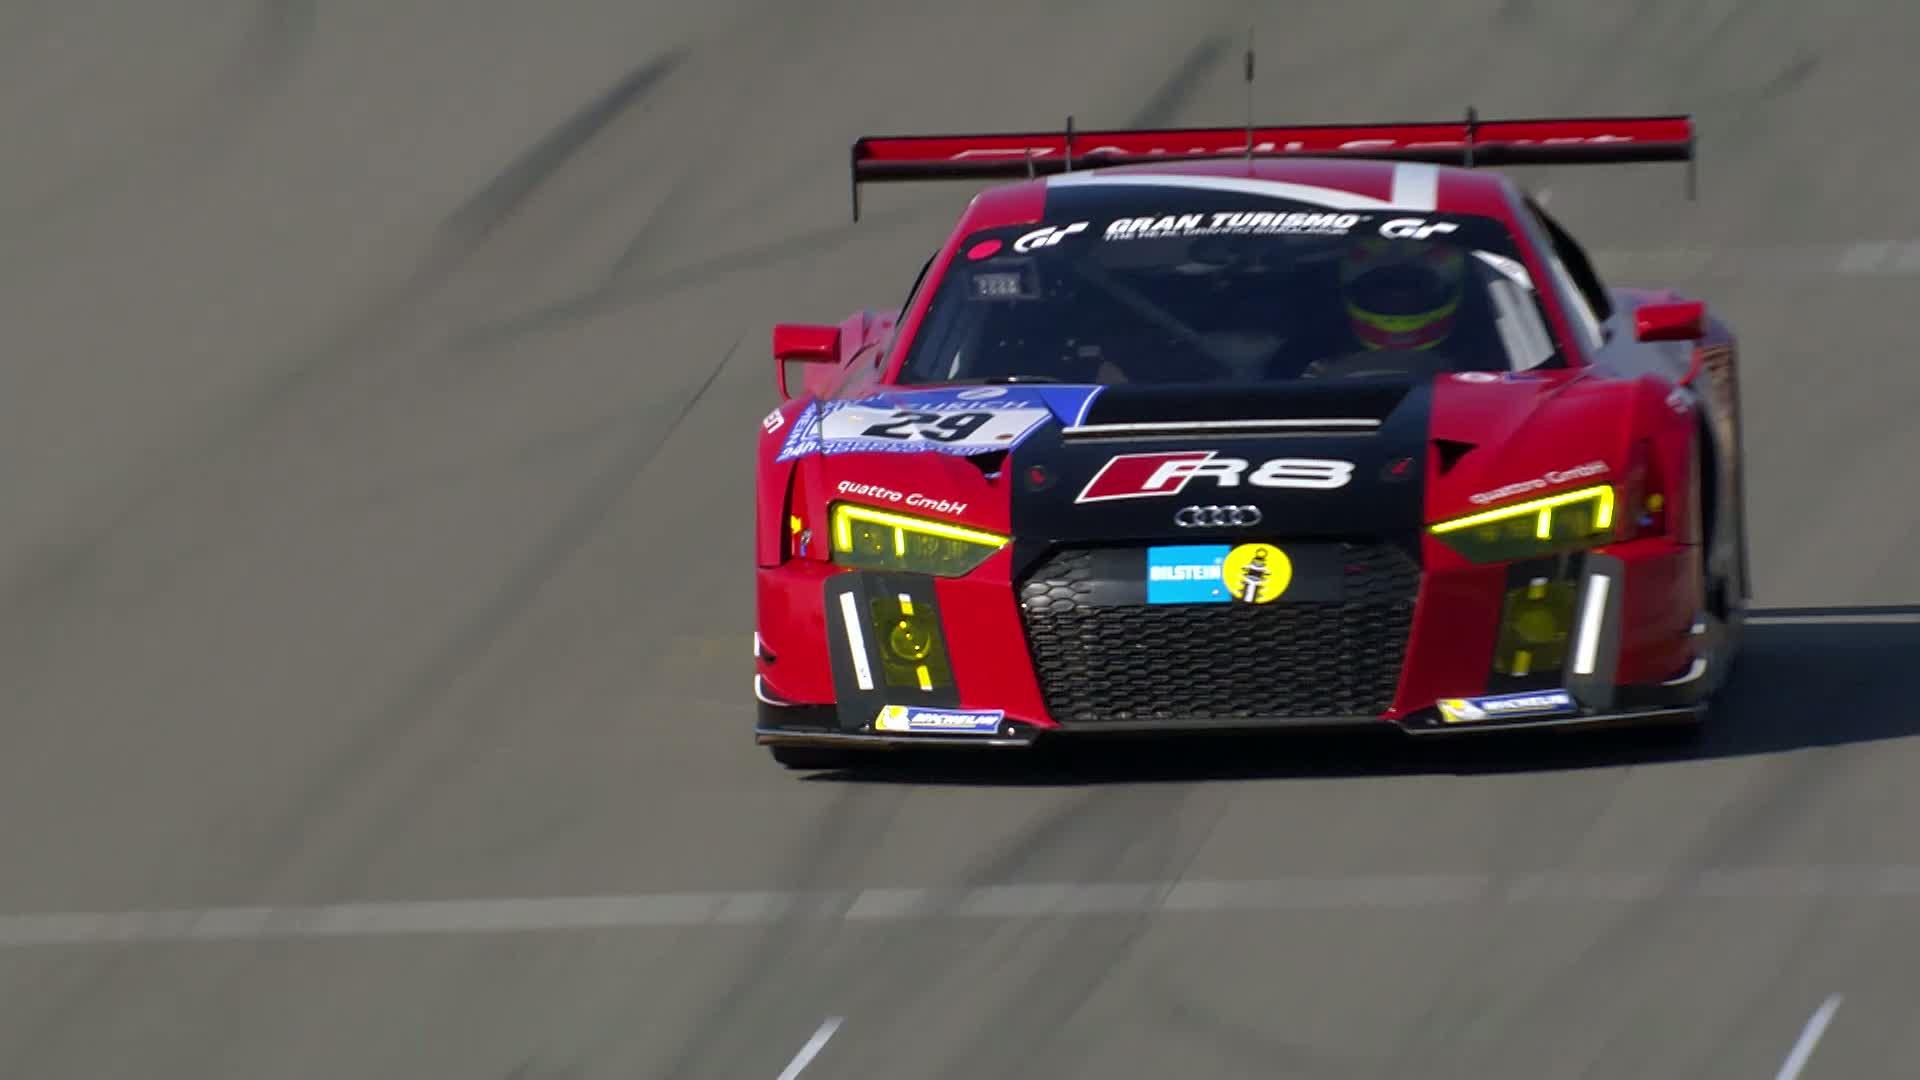 60 Seconds of Audi Sport 25/2015 - Qualifying